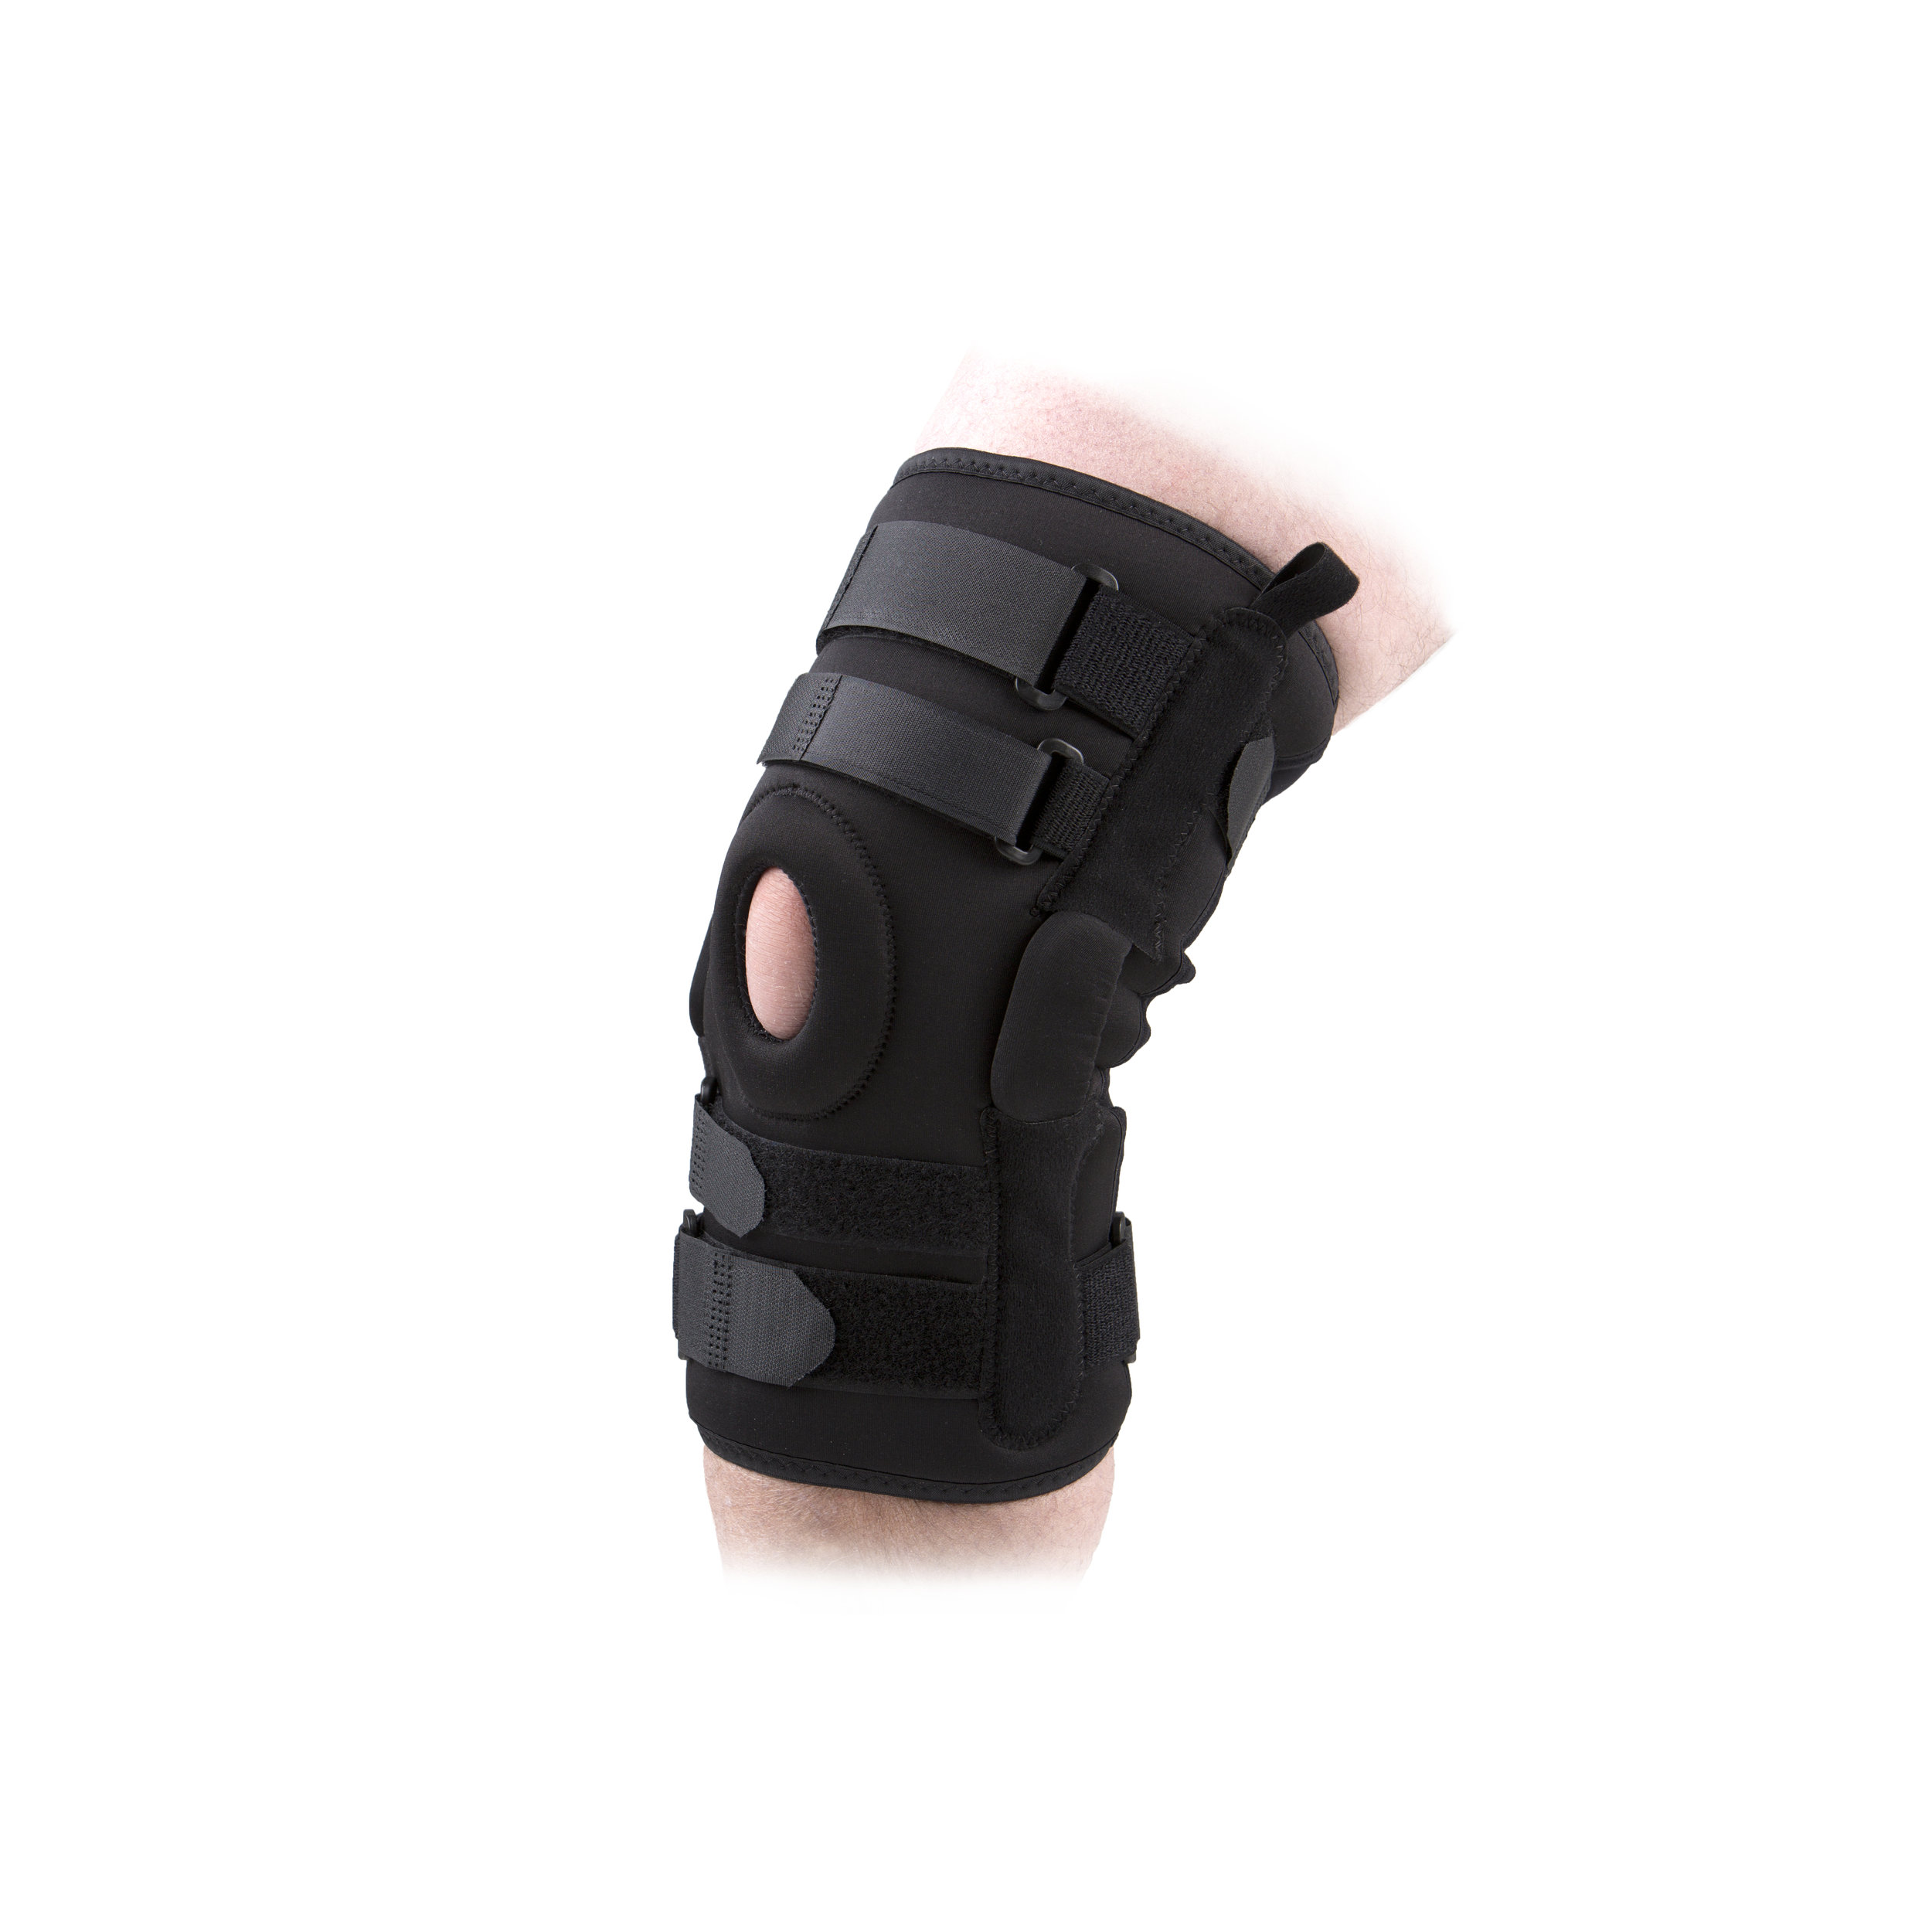 Knee brace complete